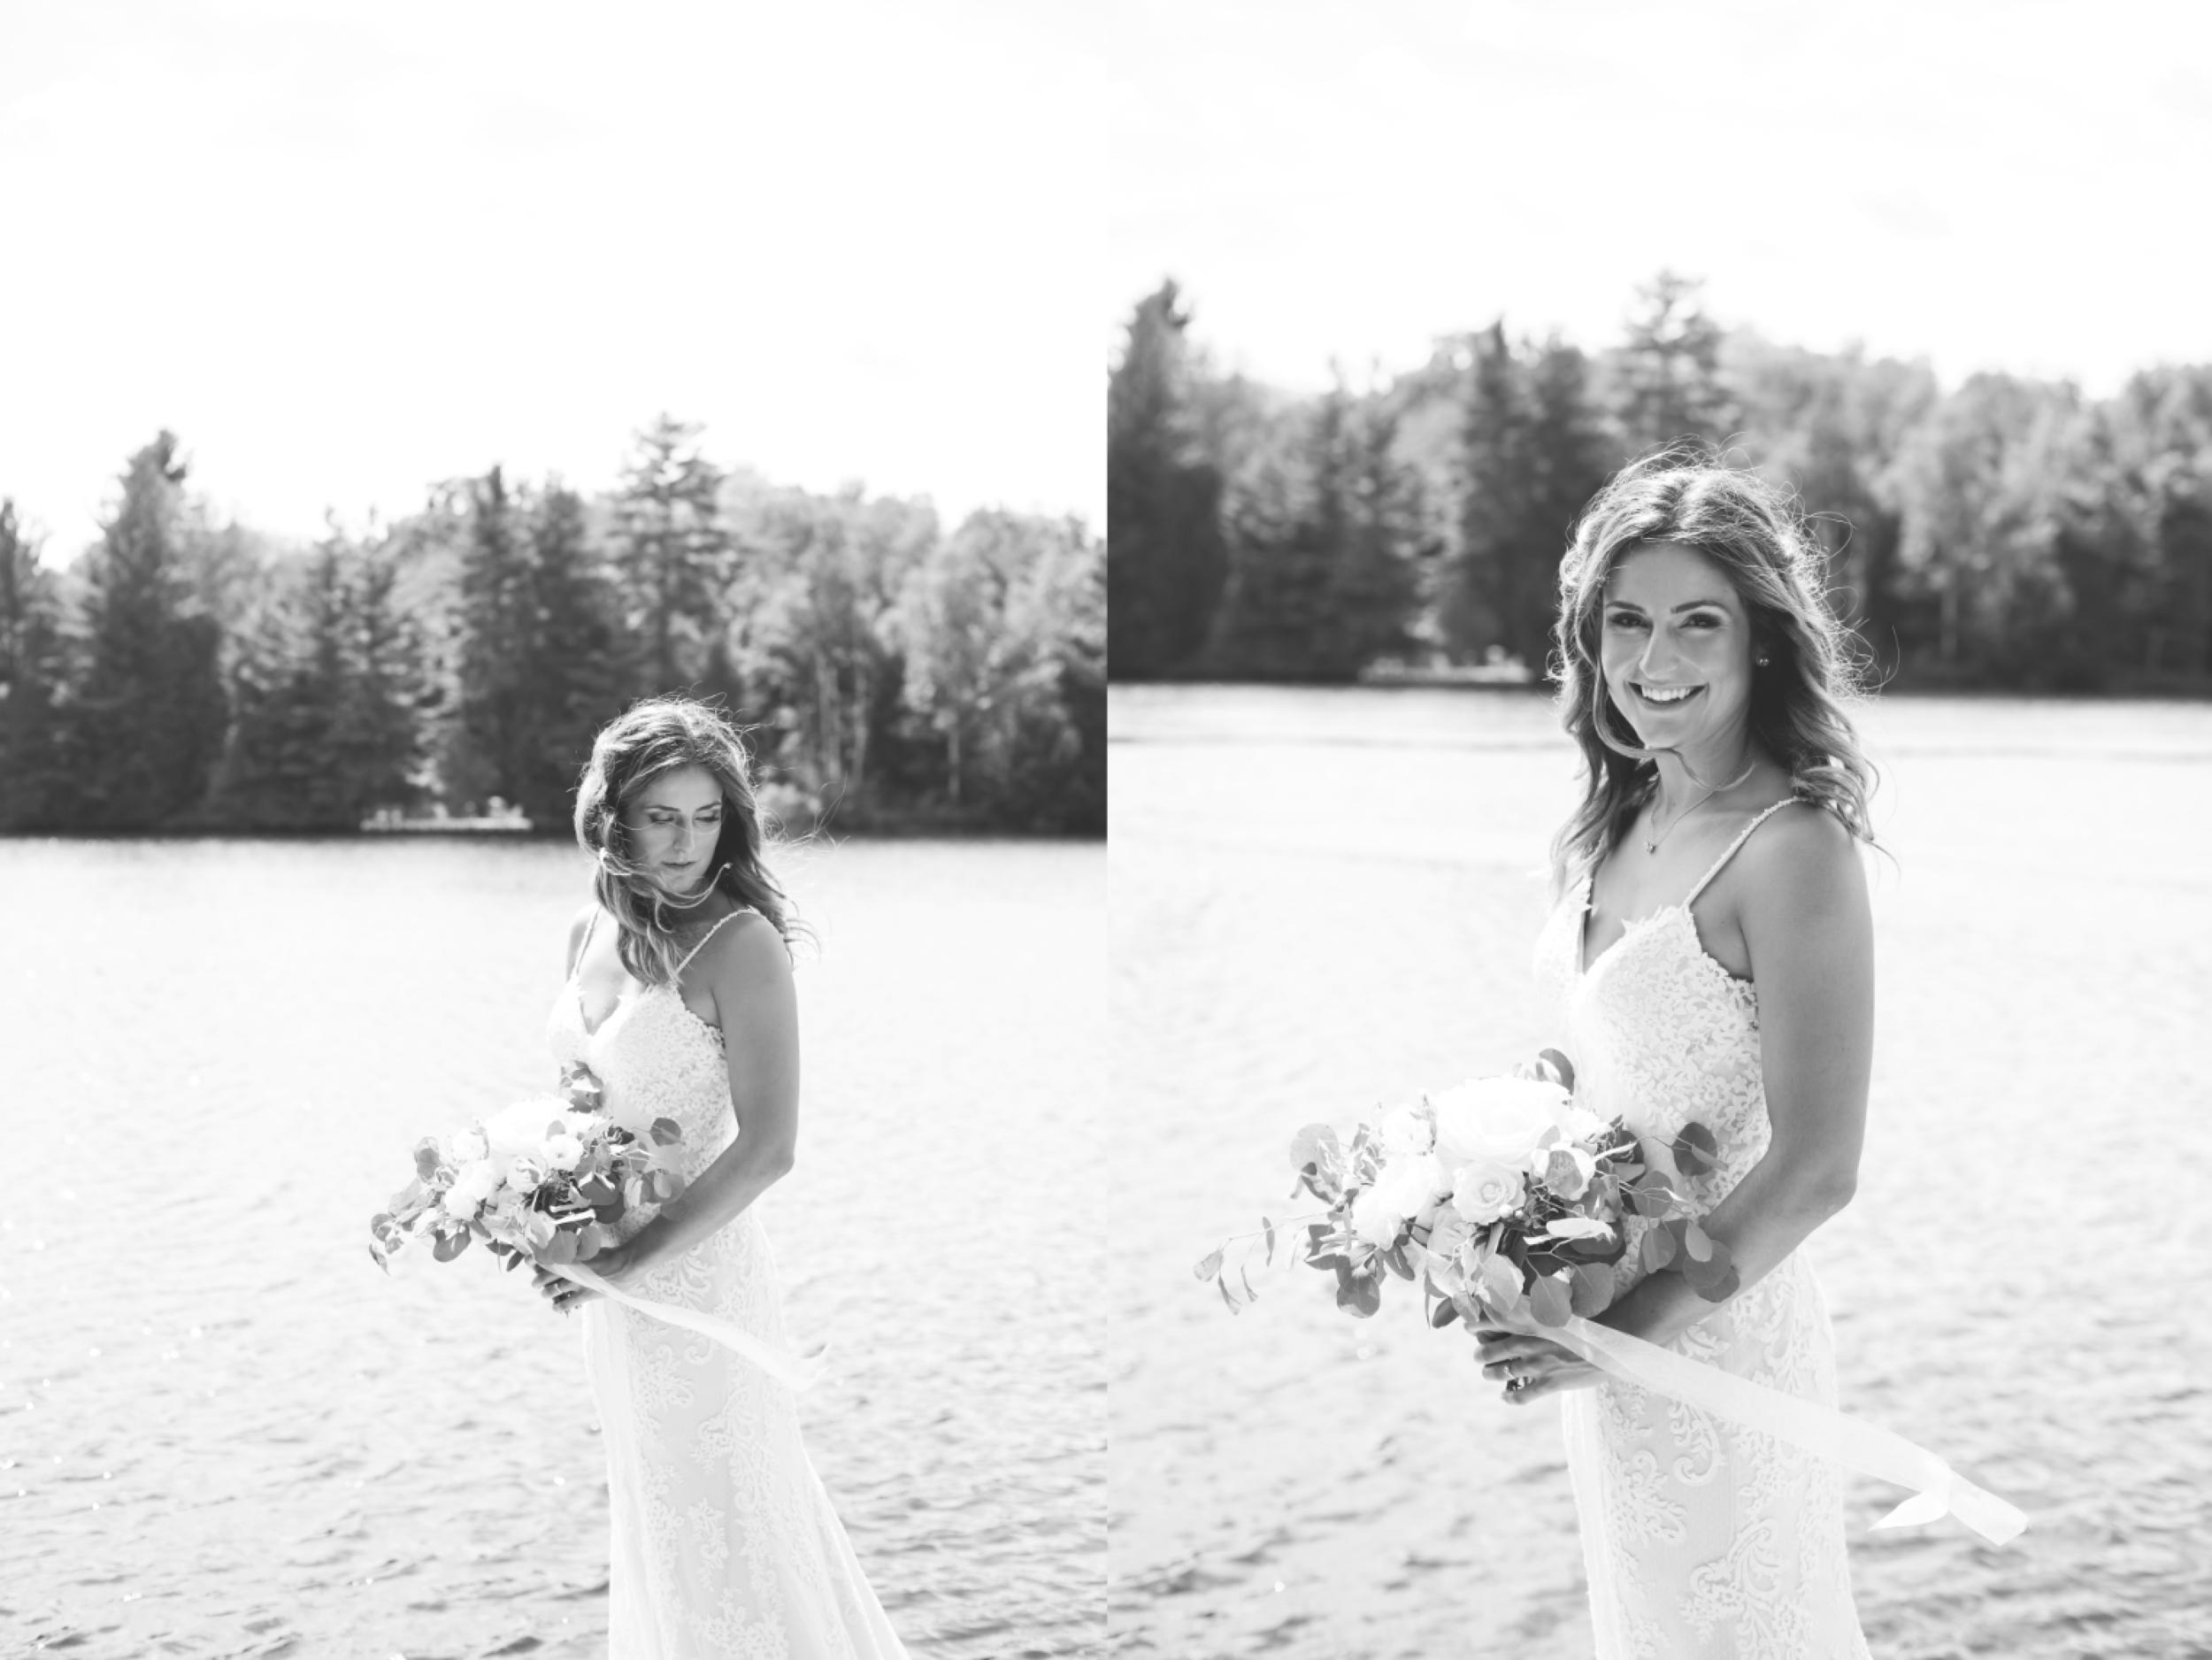 Wedding-Photos-Muskoka-Clevelands-House-Photographer-Wedding-Hamilton-GTA-Niagara-Oakville-Moments-by-Lauren-Photography-Photo-Image-44.png